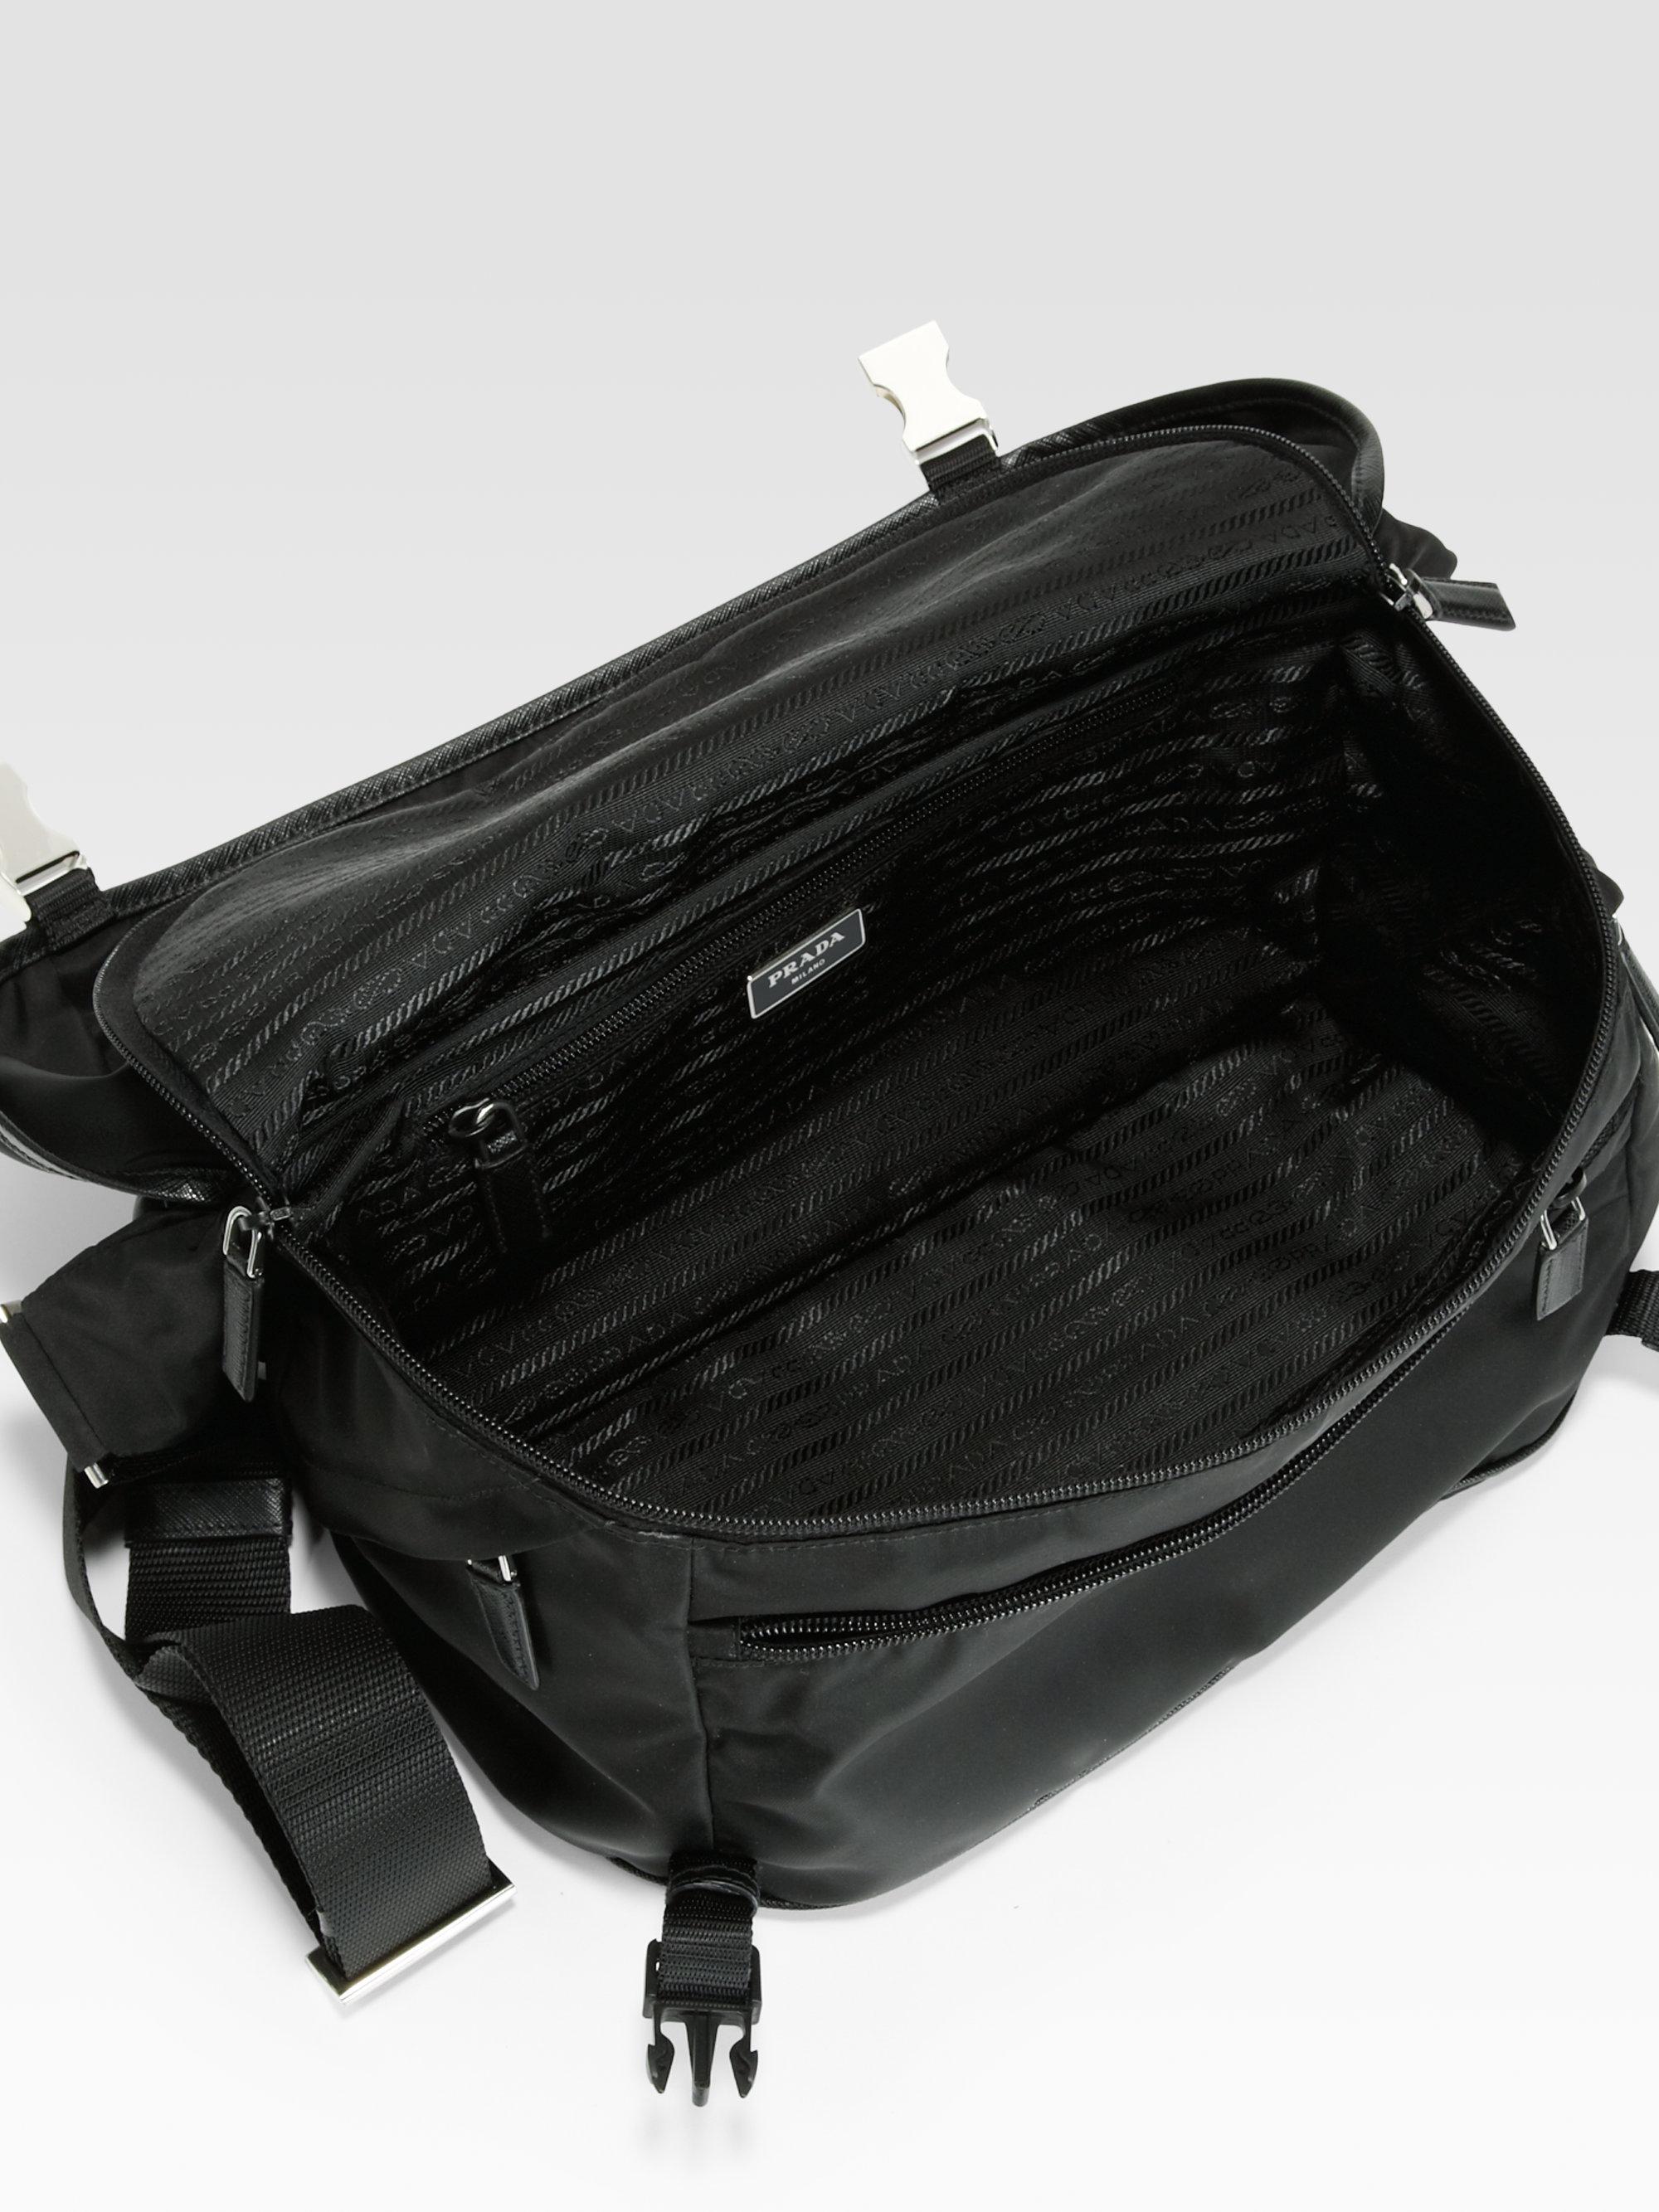 8130429ee9daaf ... germany lyst prada small nylon shoulder bag in black for men e6db9 68e92